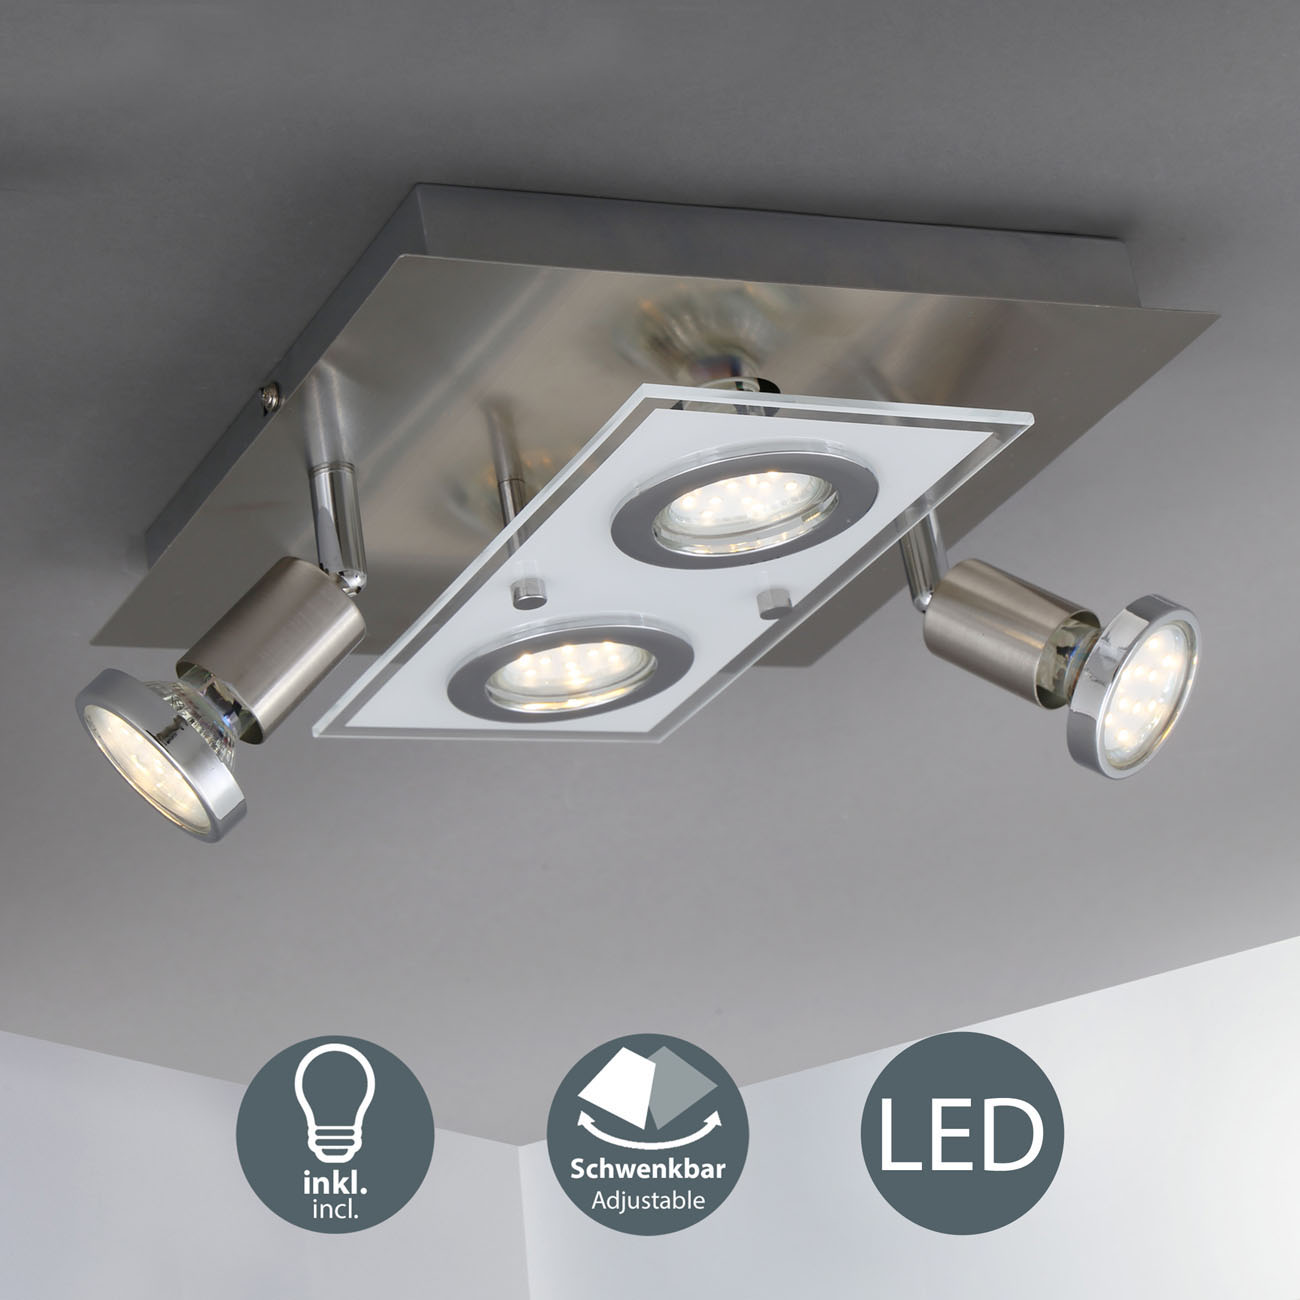 LED Kombi Deckenleuchte Spotleuchte 4-flammig  - 3